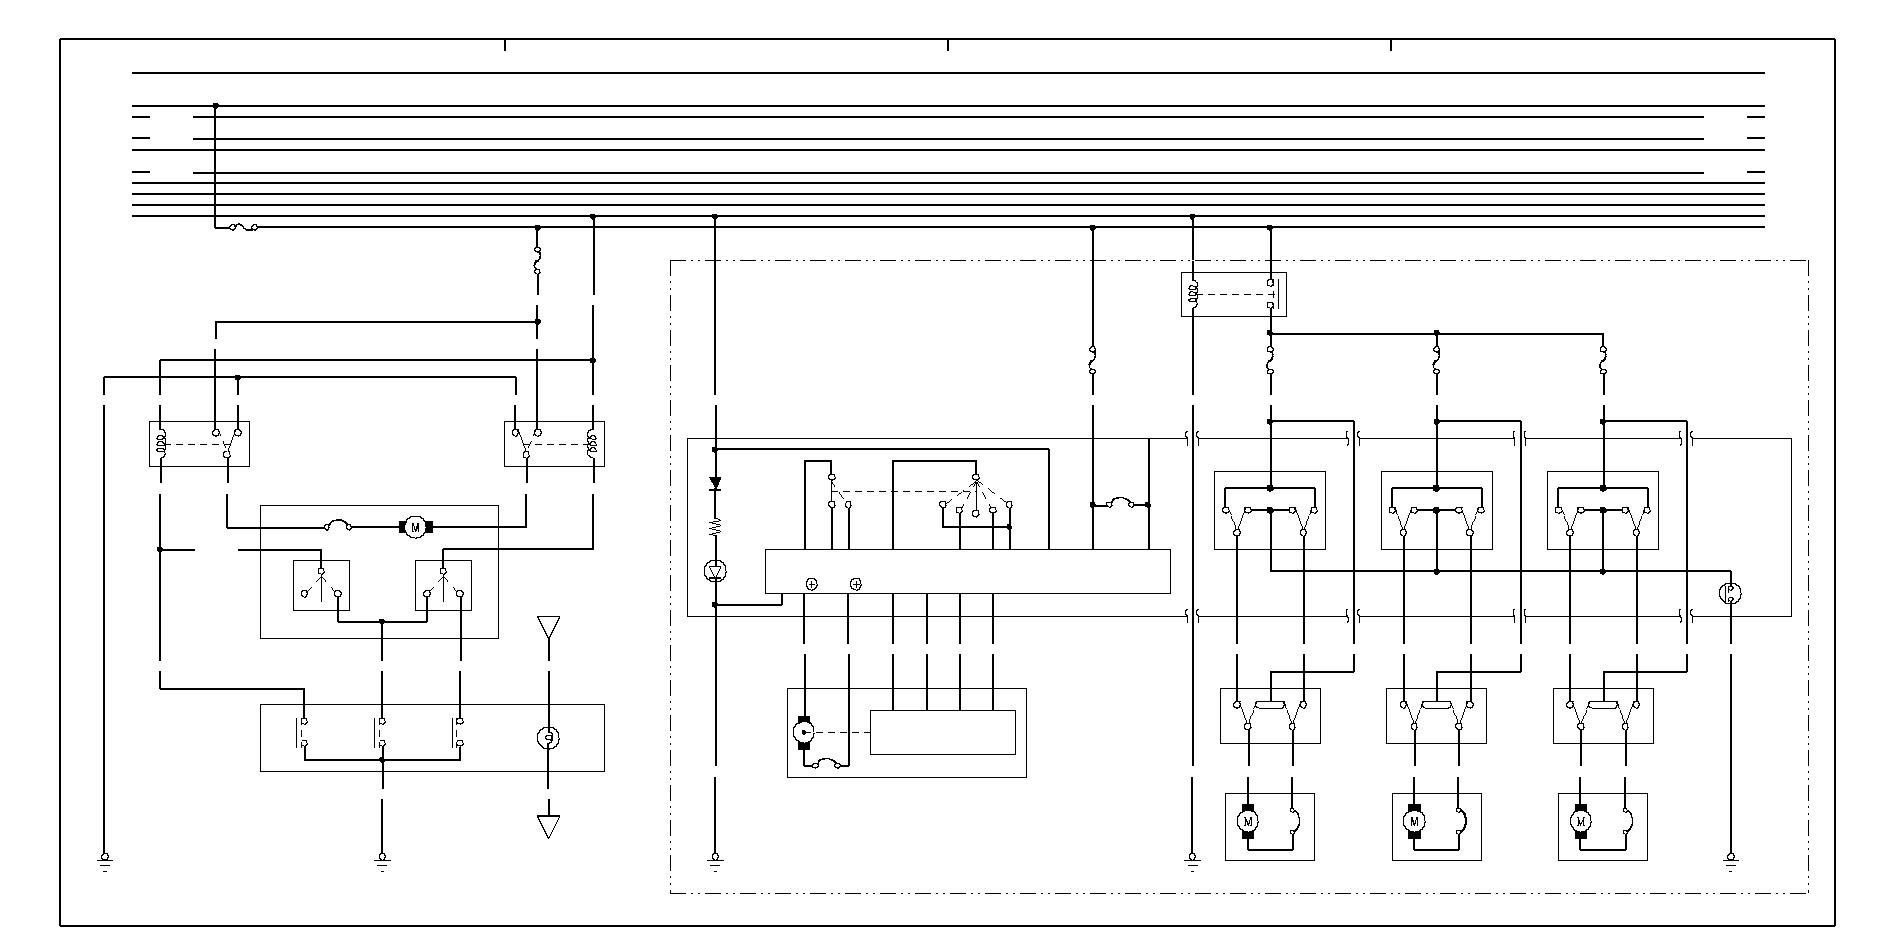 Chevy Aveo Radio Wiring Diagram - Wiring Diagram